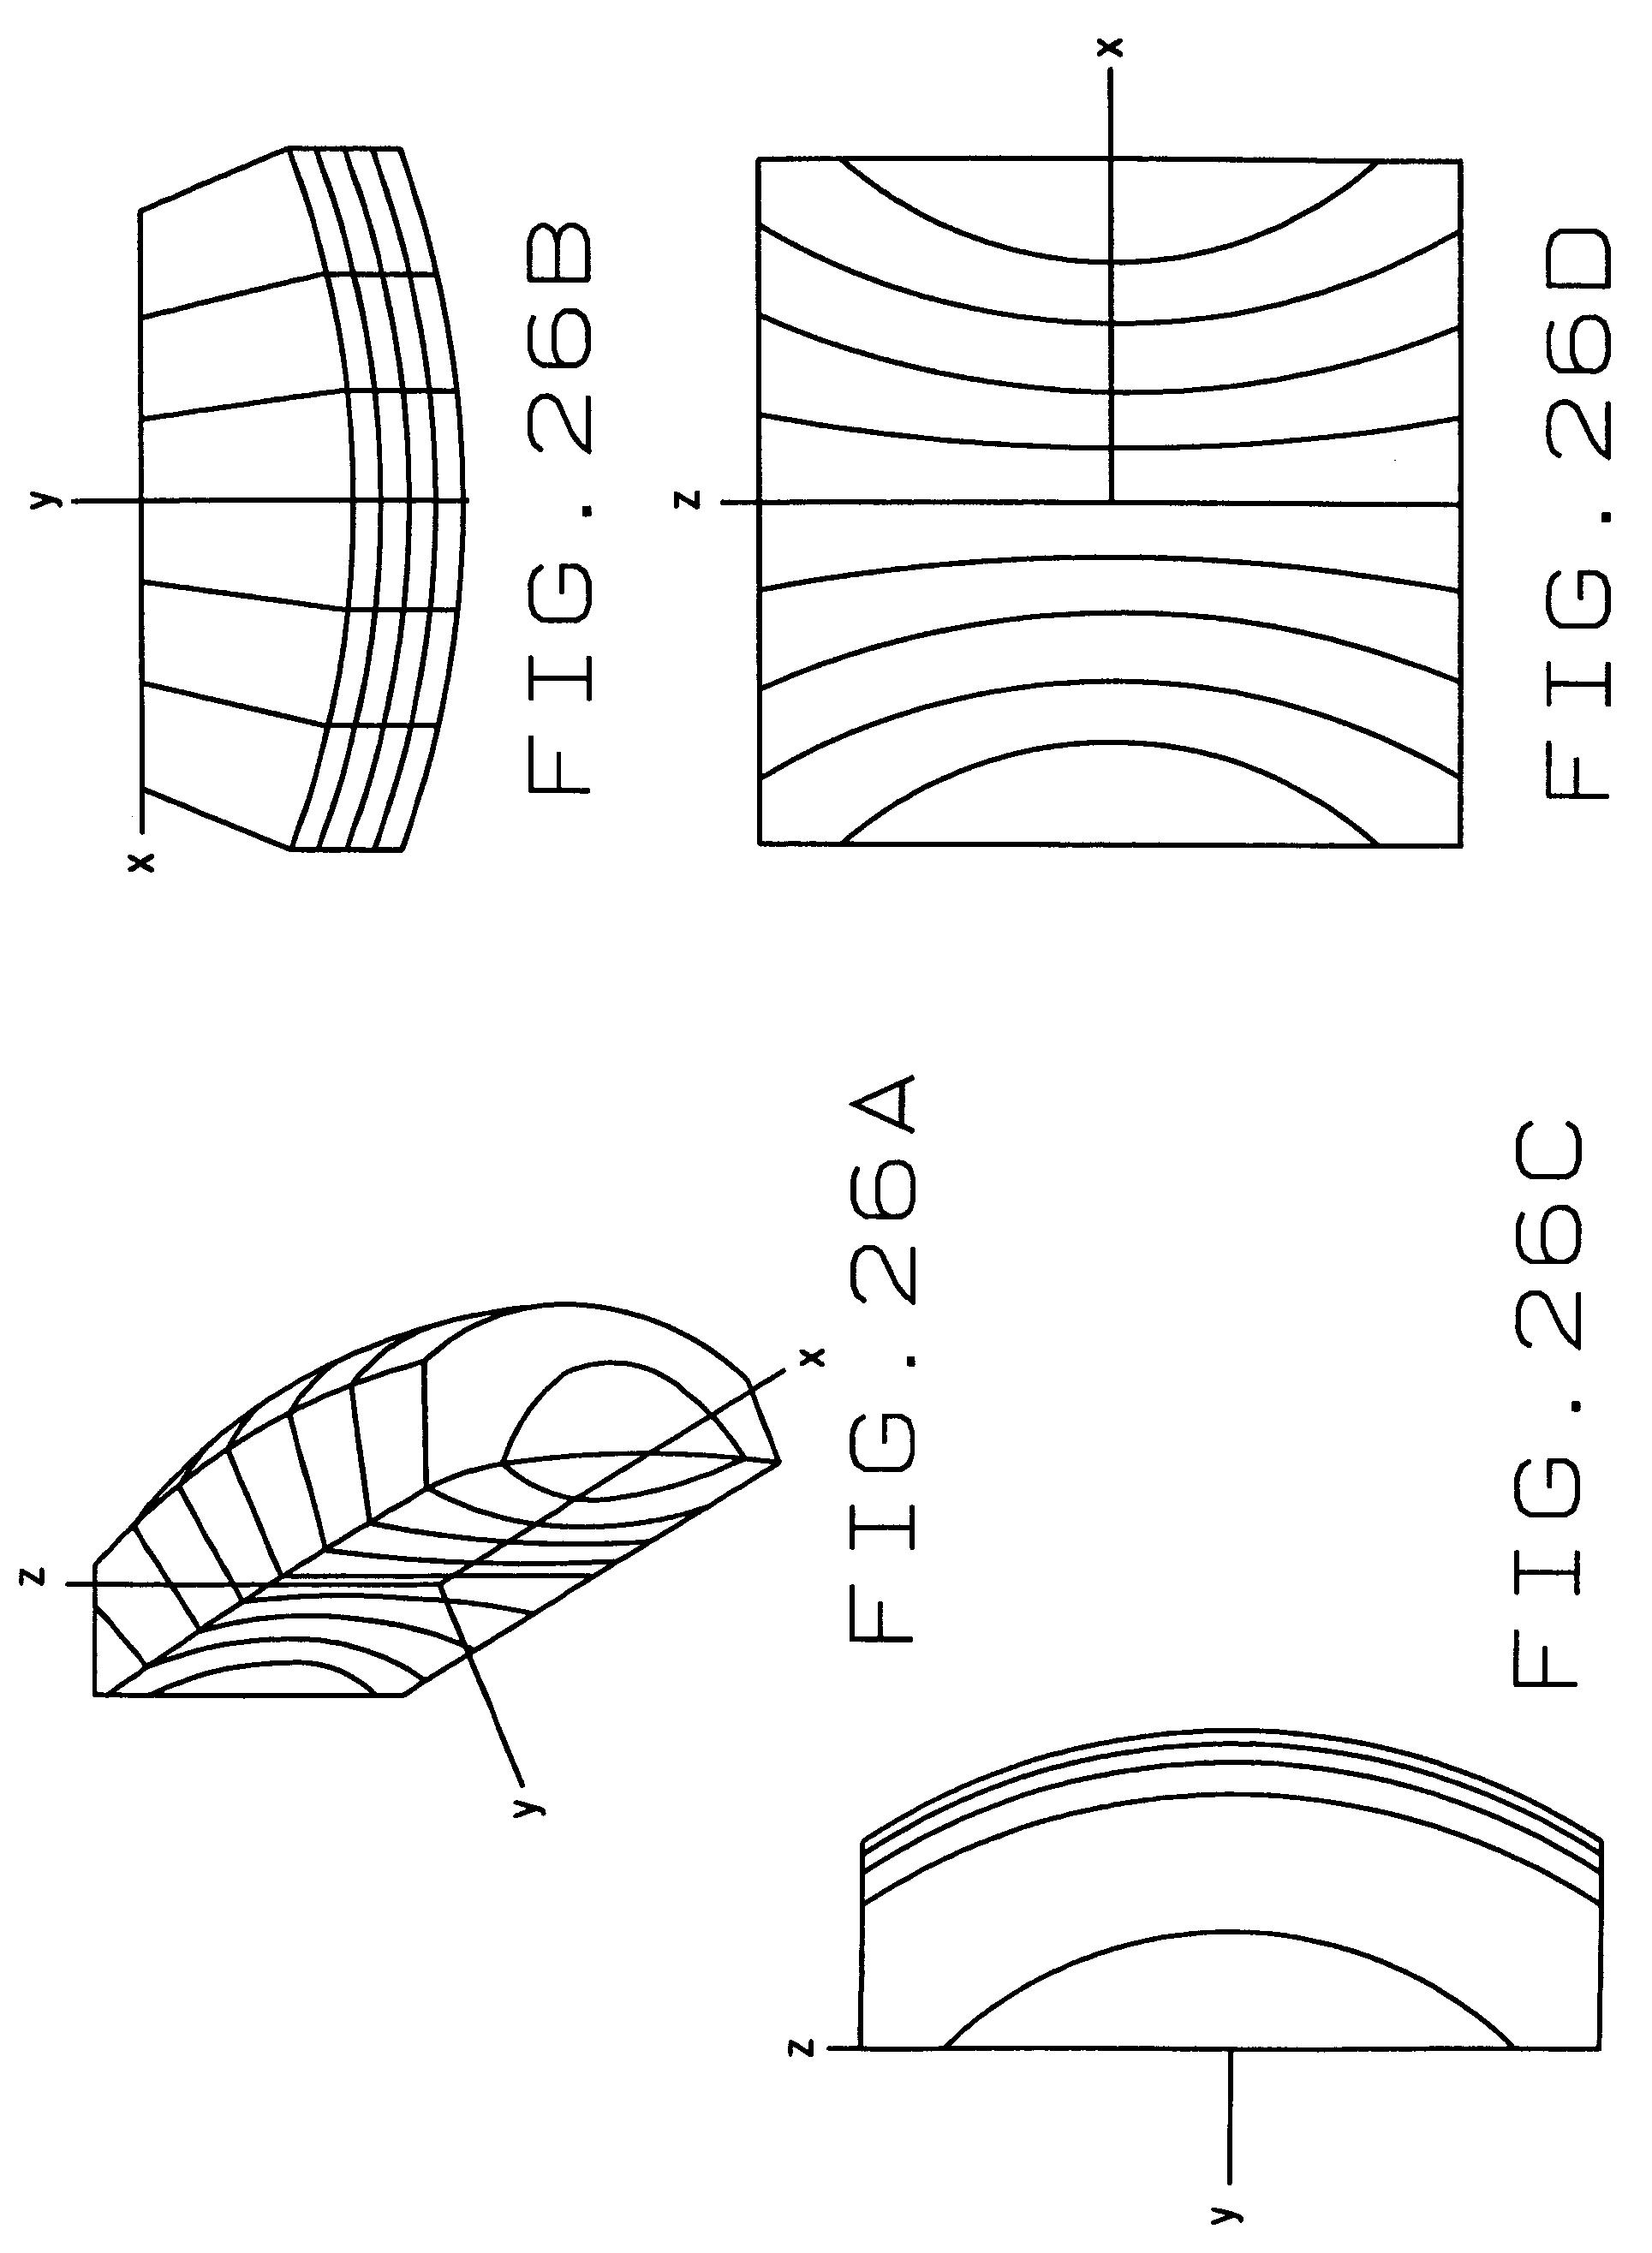 segment magnets